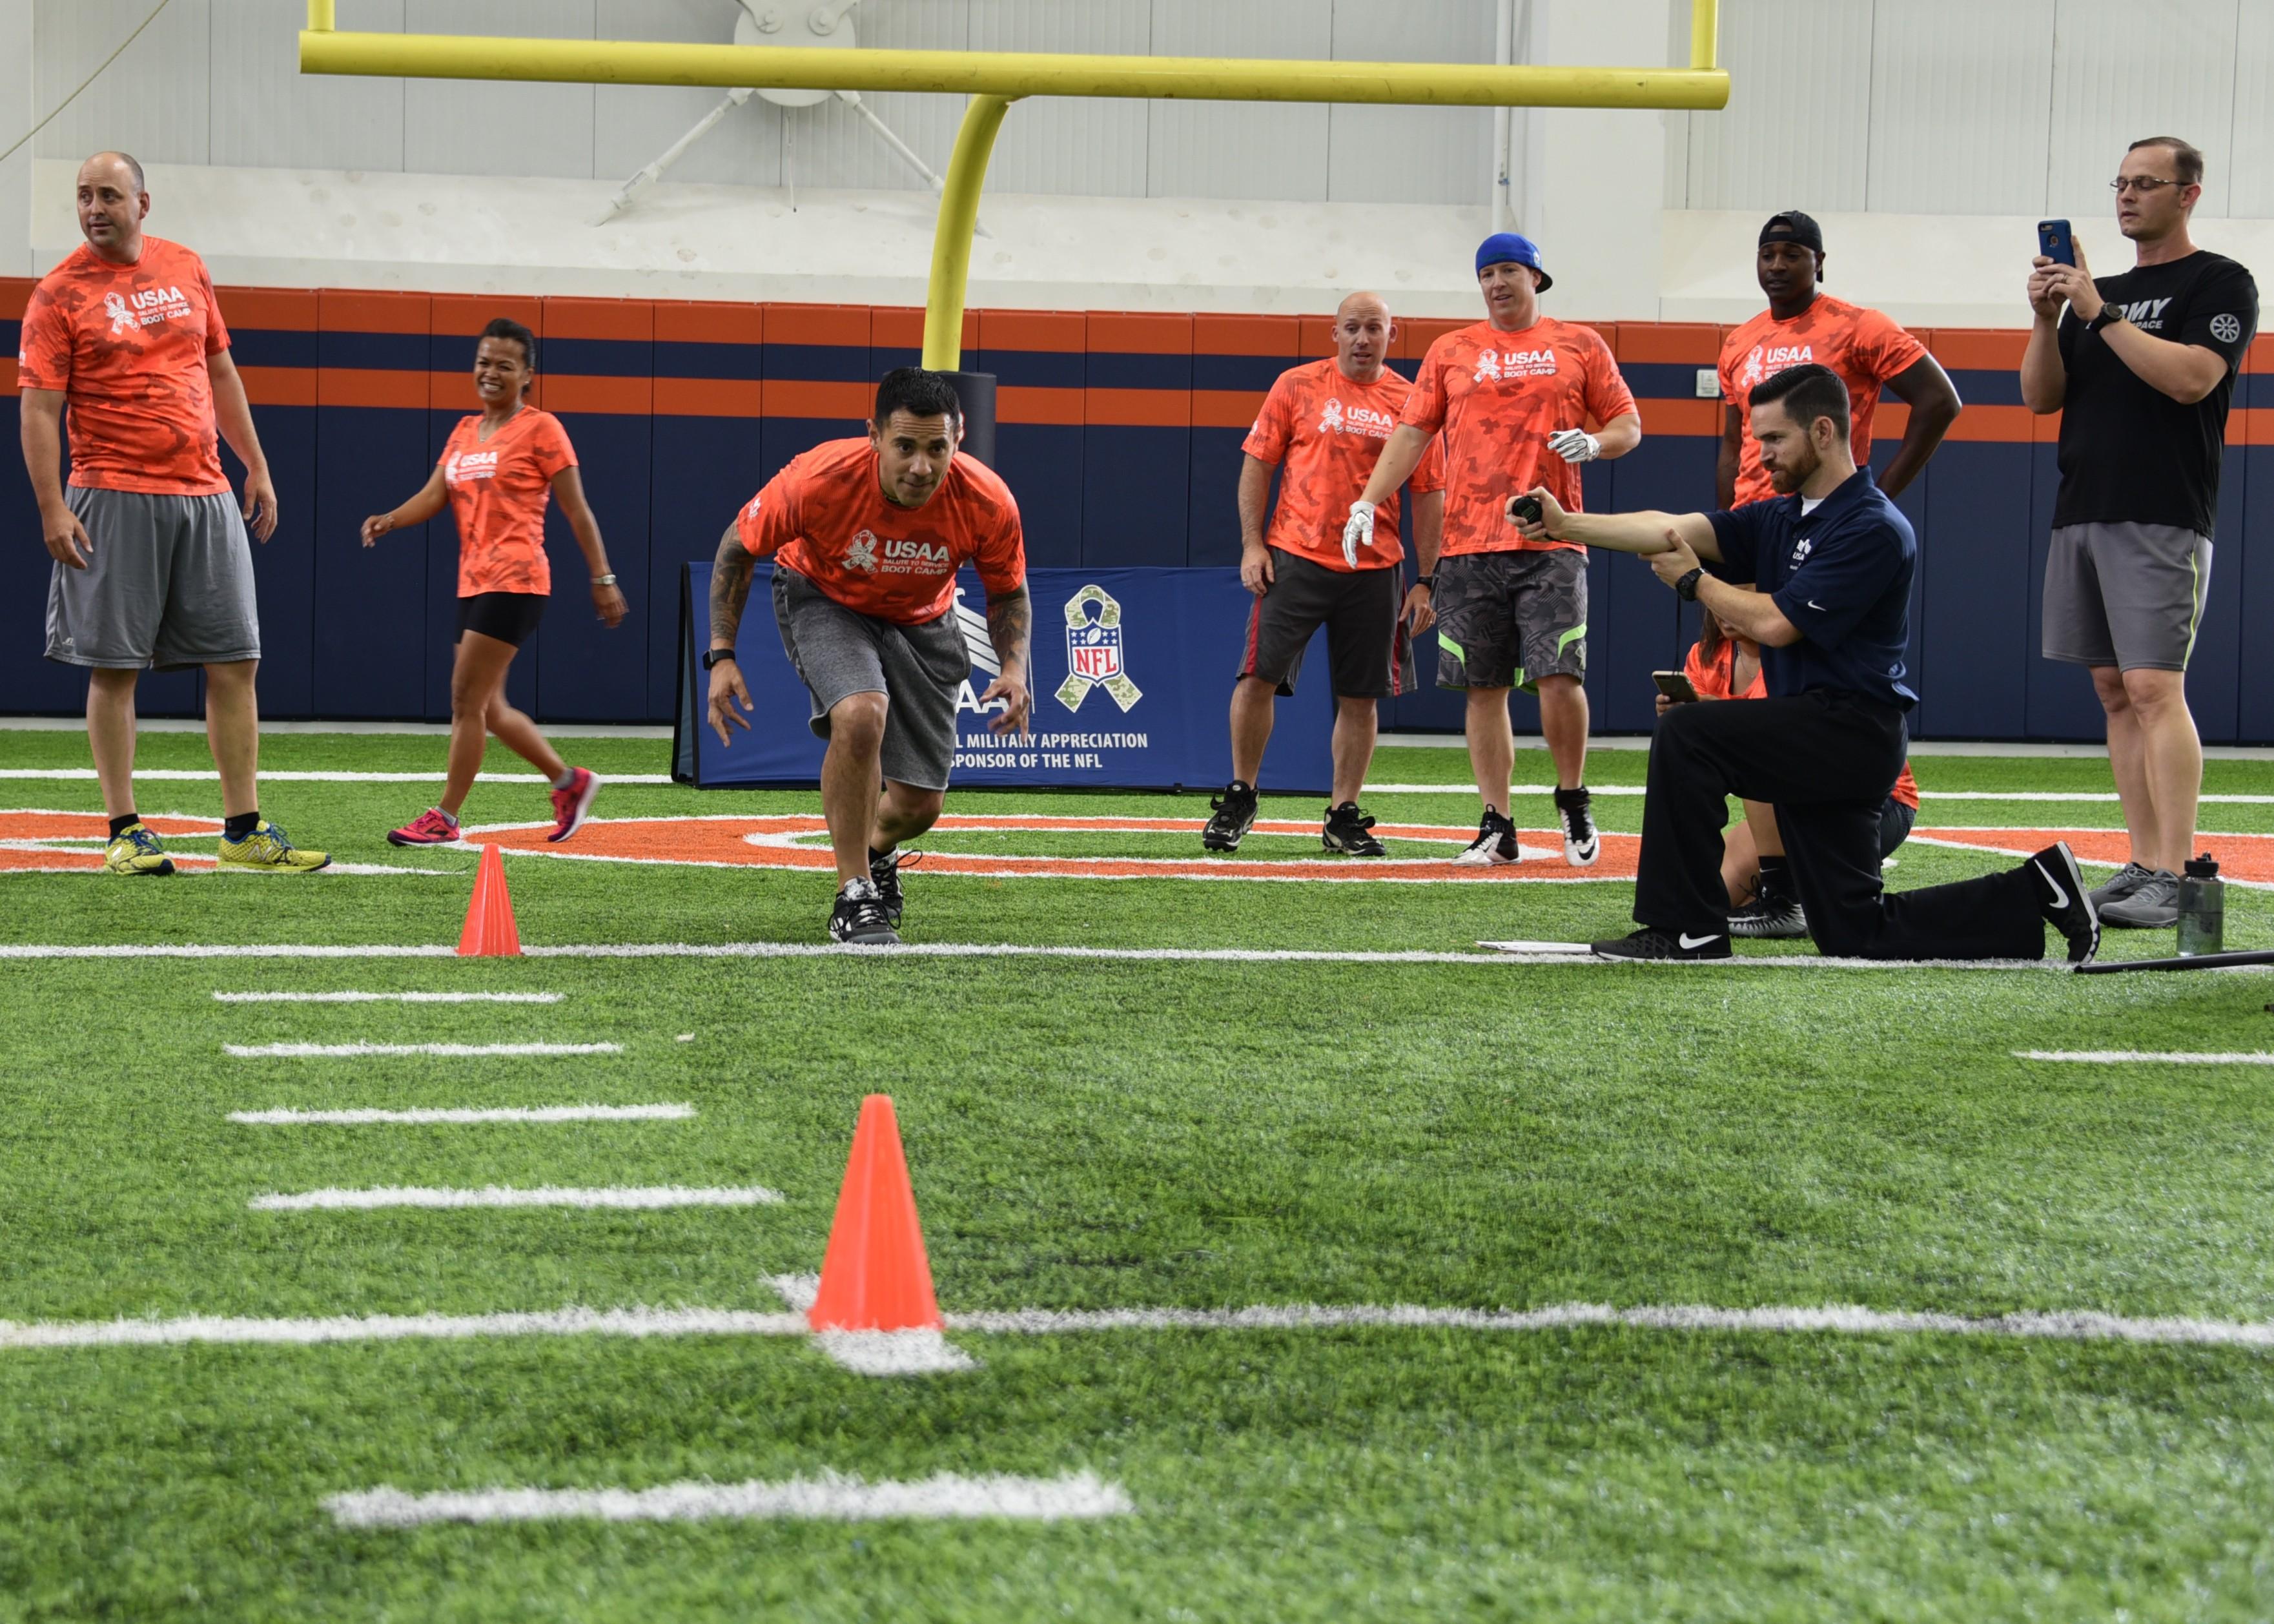 Team SMDC wins USAA Broncos training camp competition  db6546b4e